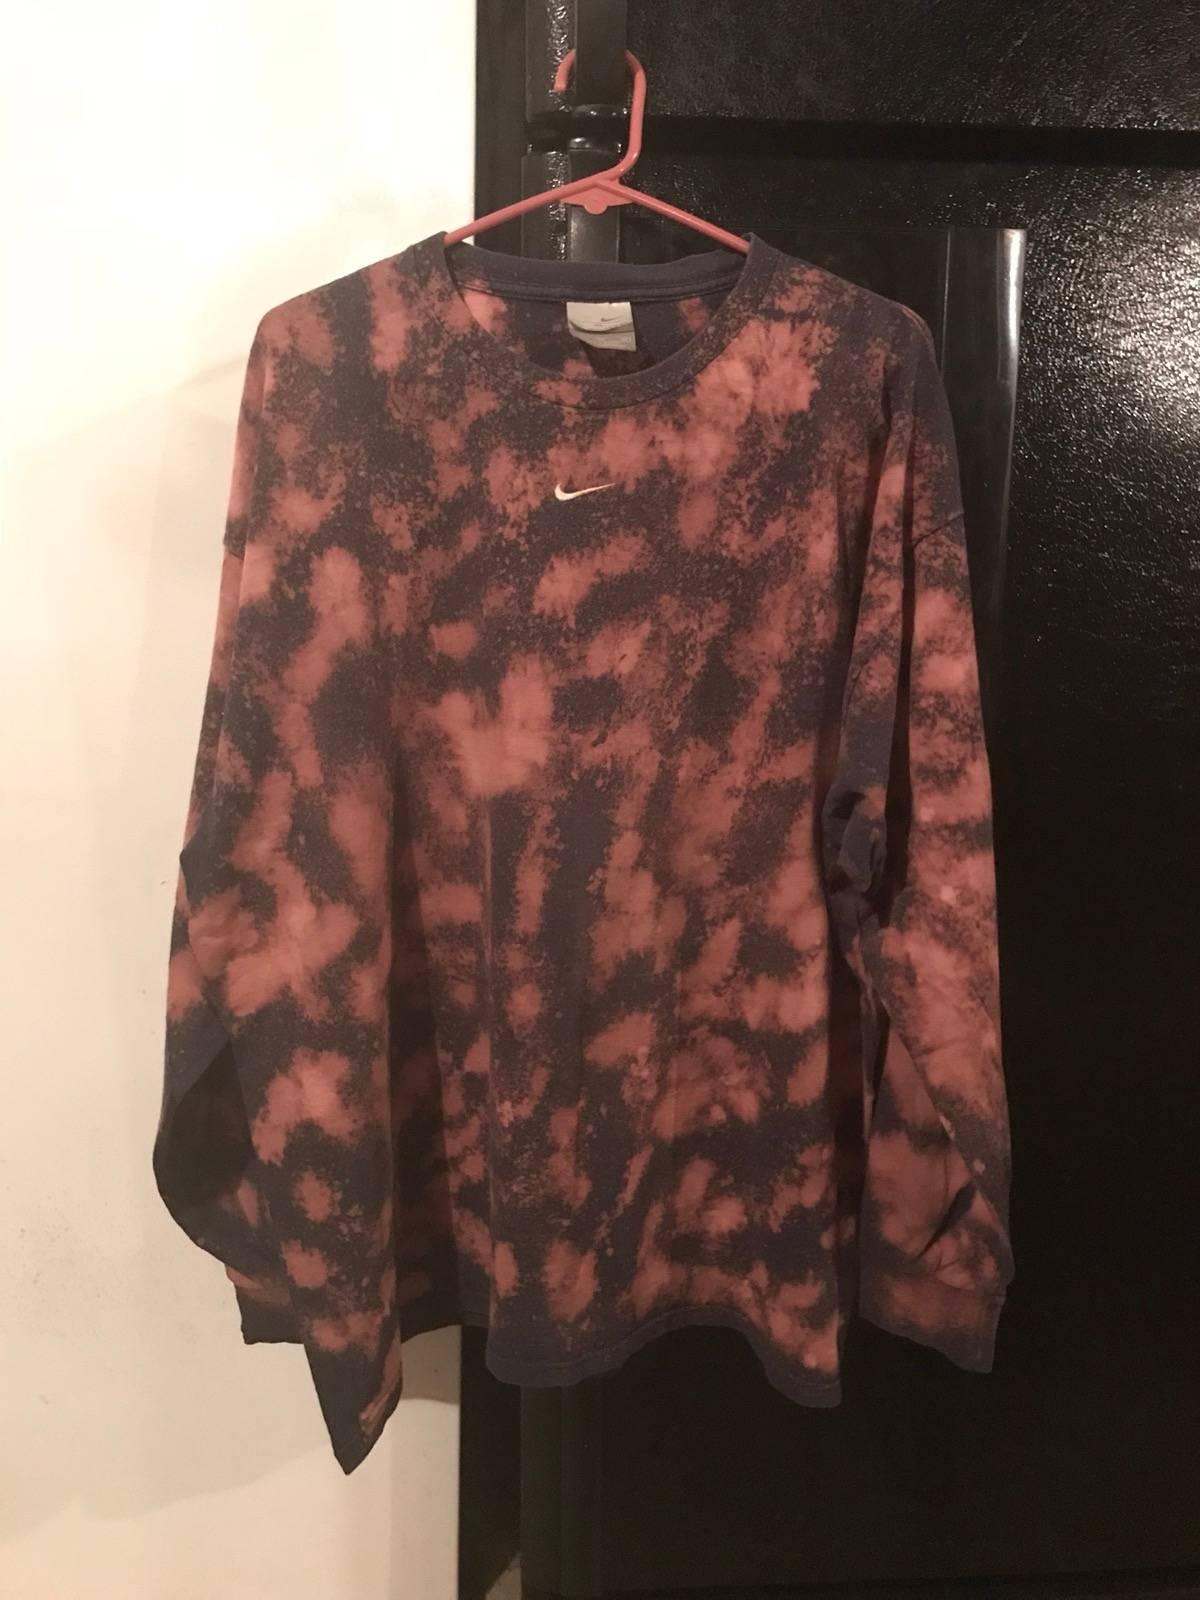 Nike Custom Bleach Dyed Nike Long Sleeve Shirt Size Xl Long Sleeve